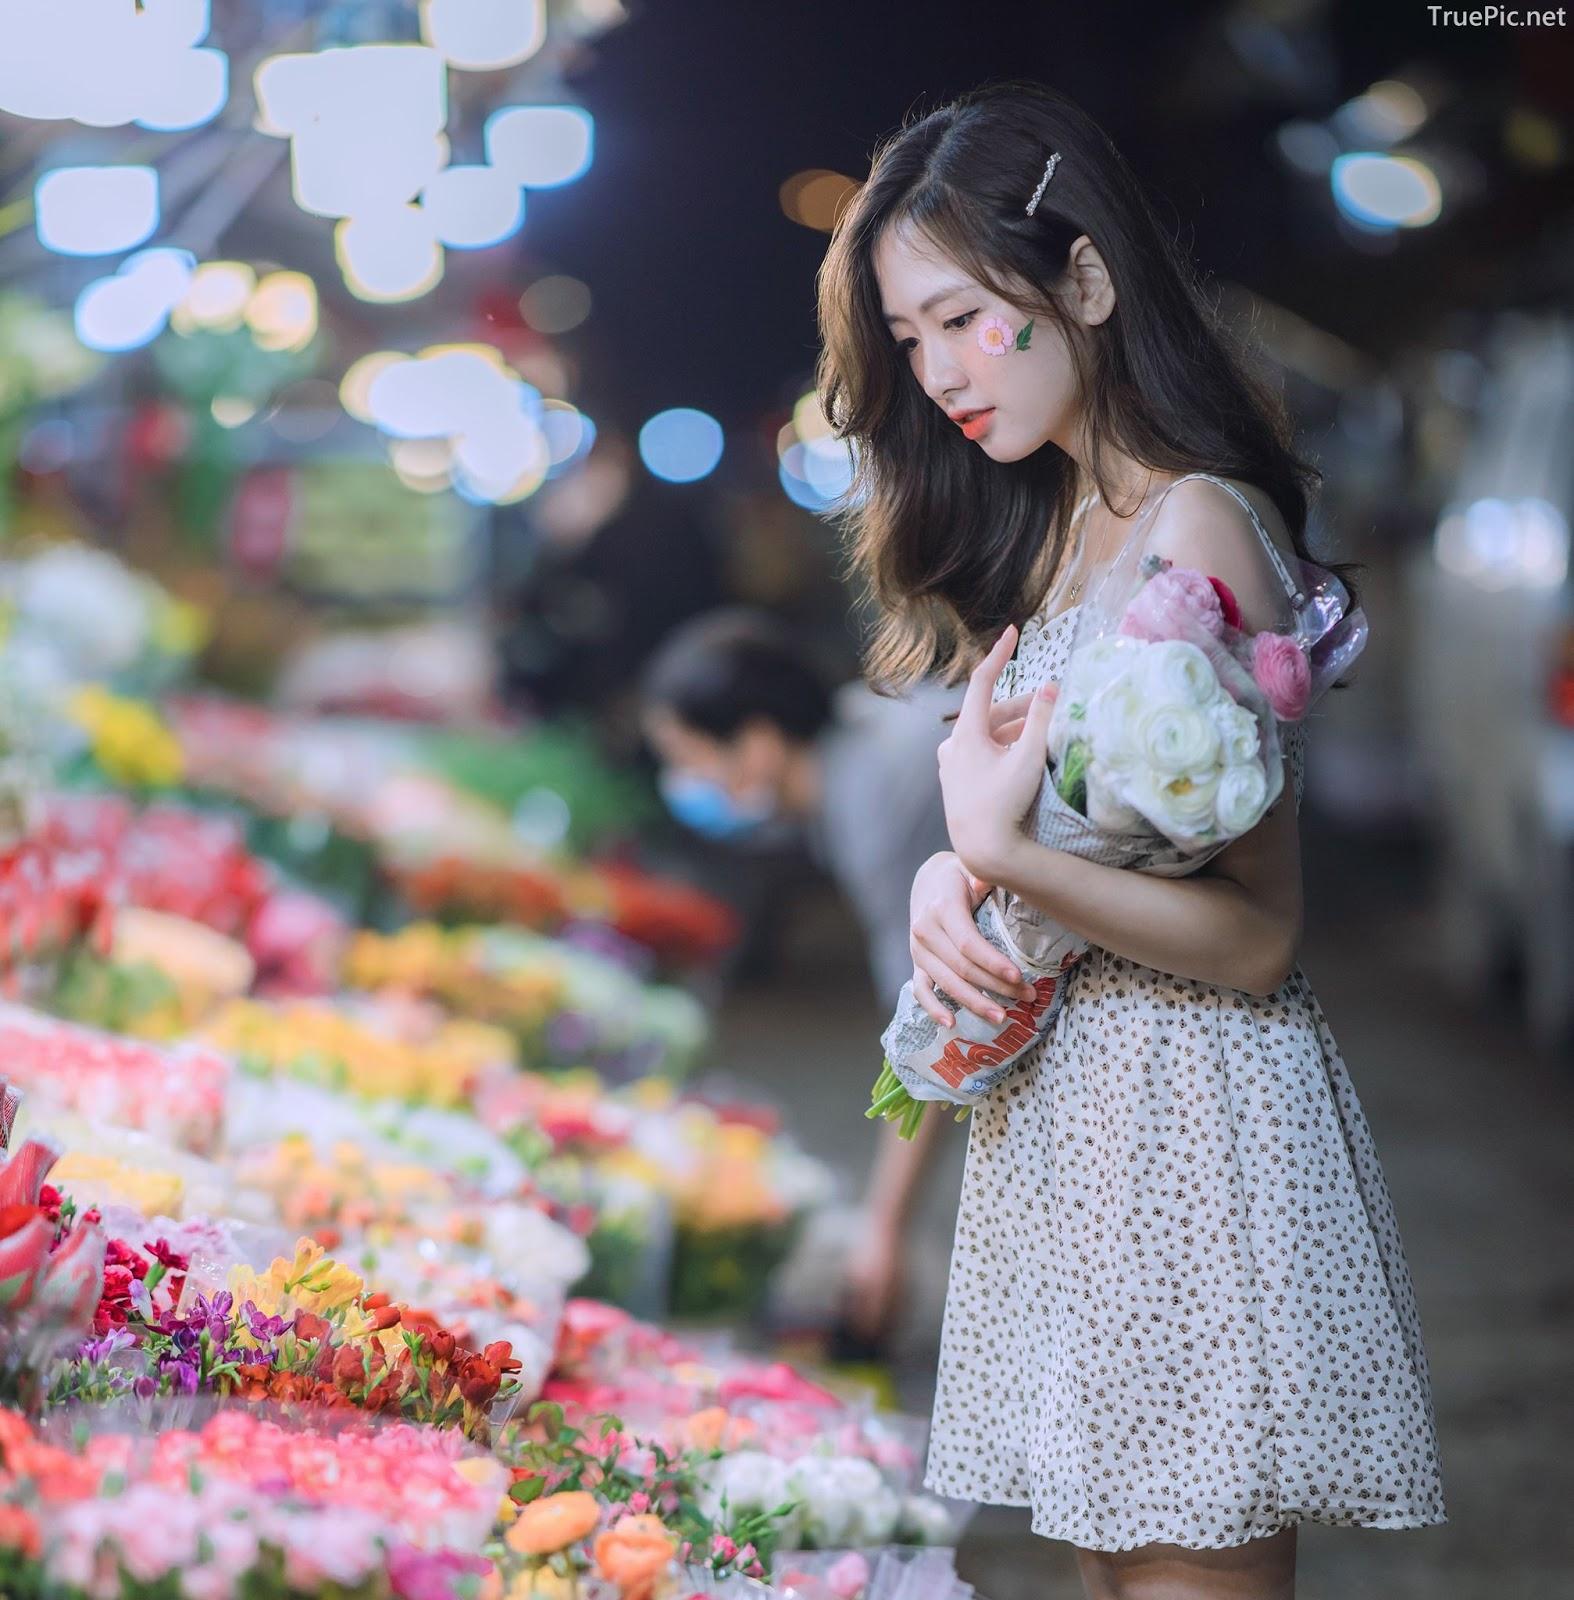 Vietnamese Hot Girl Linh Hoai - Strolling on the flower street - TruePic.net - Picture 7